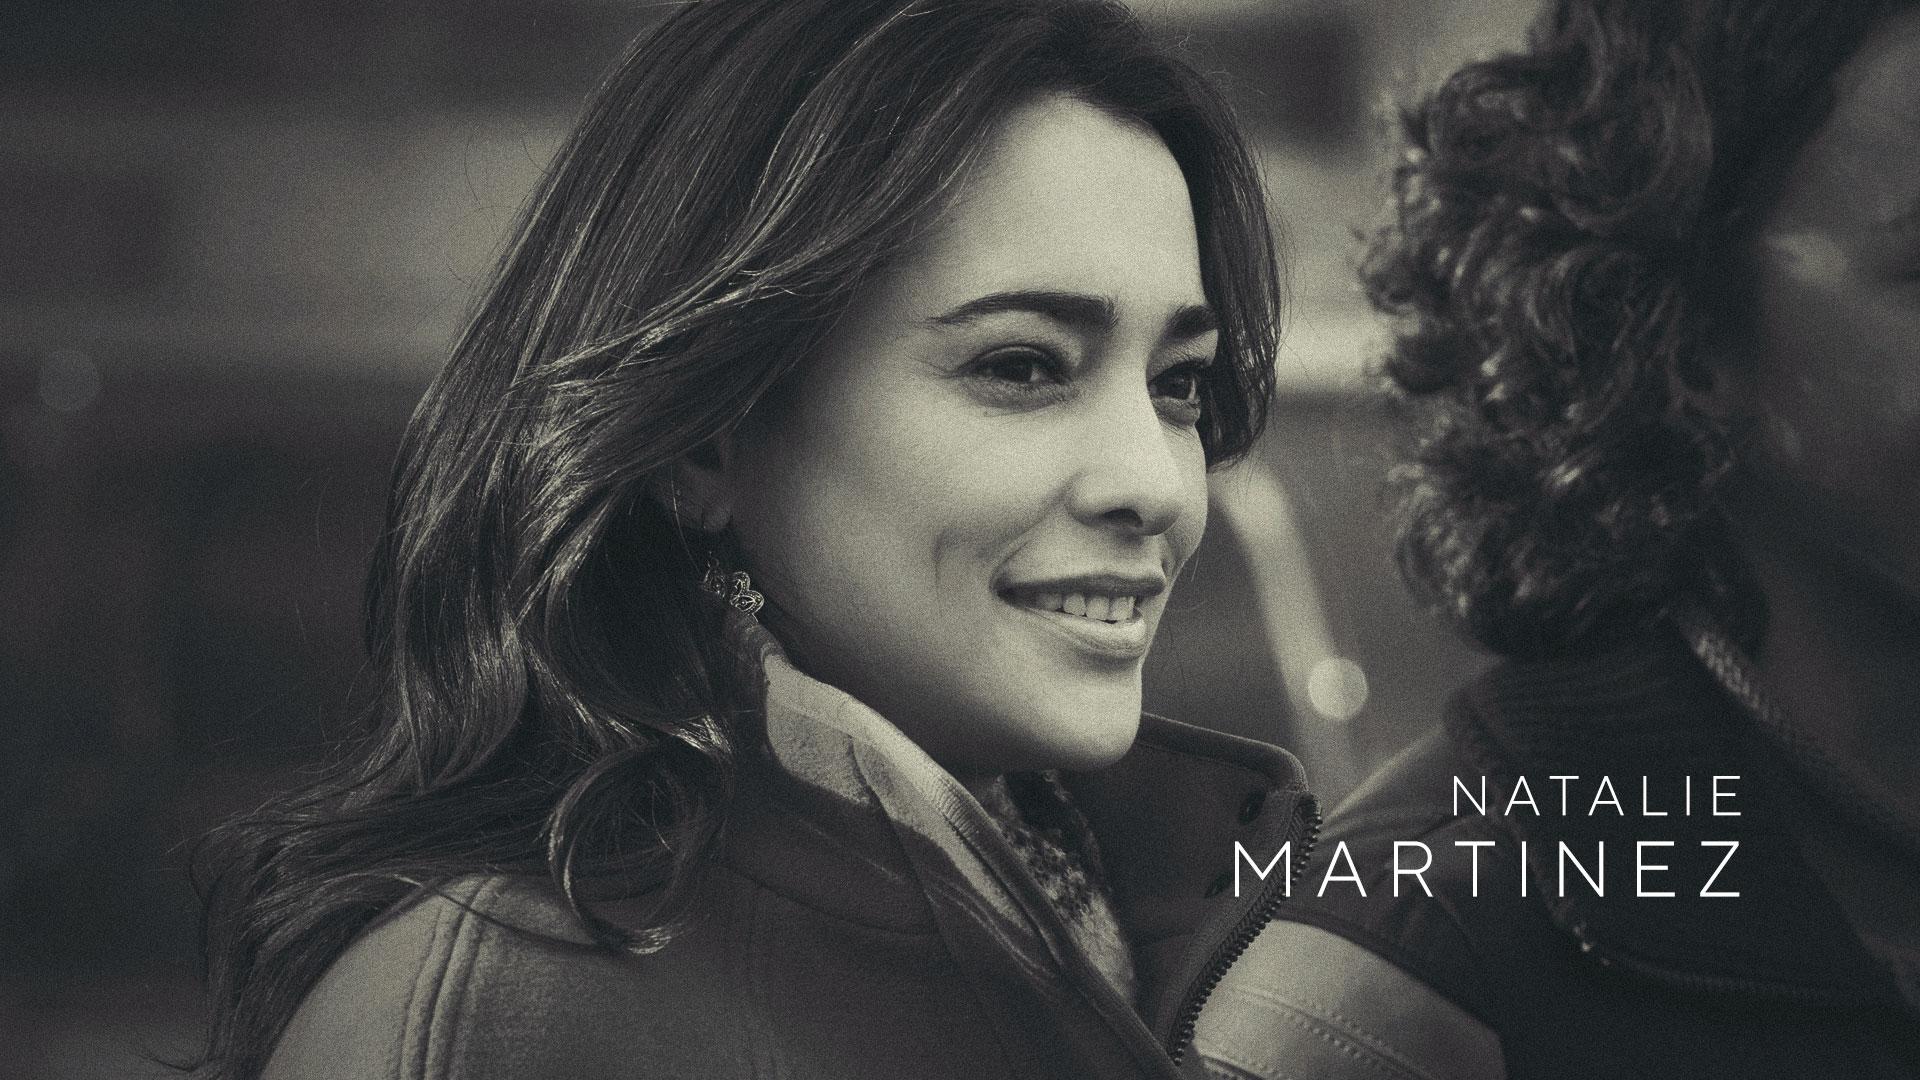 Natalie Martinez as Ana in